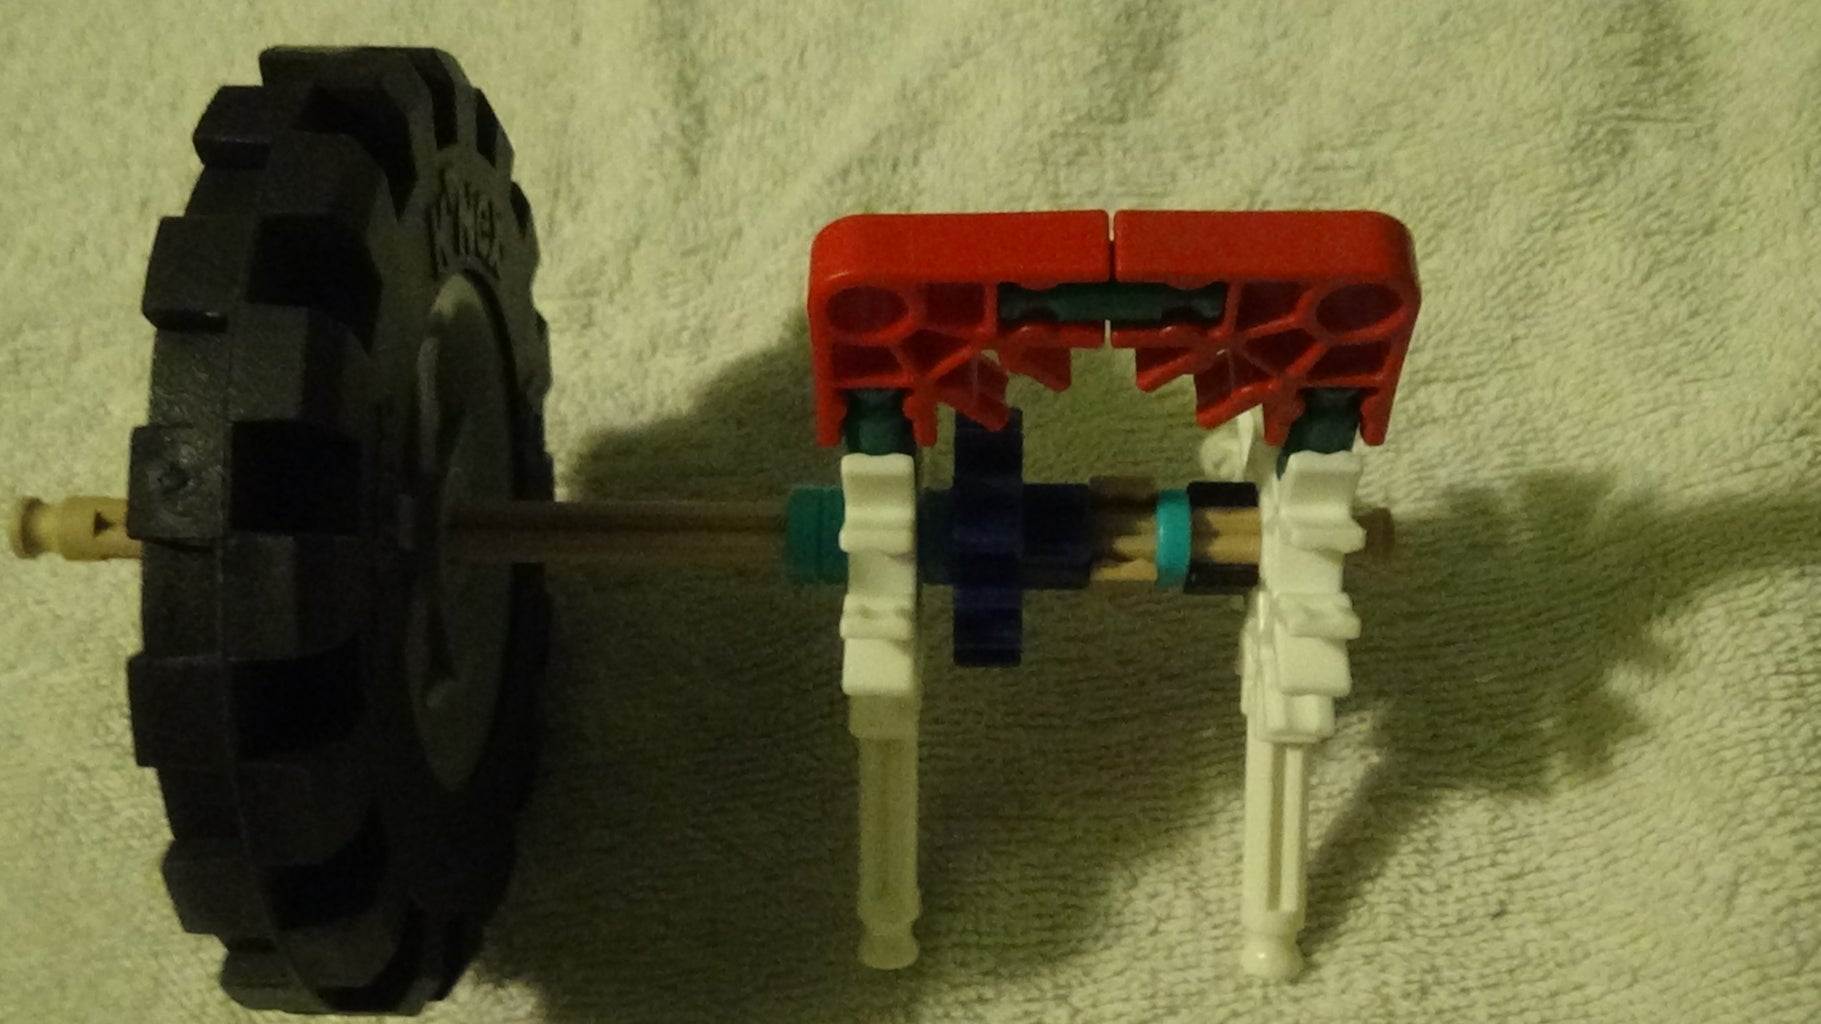 The Launch Wheel